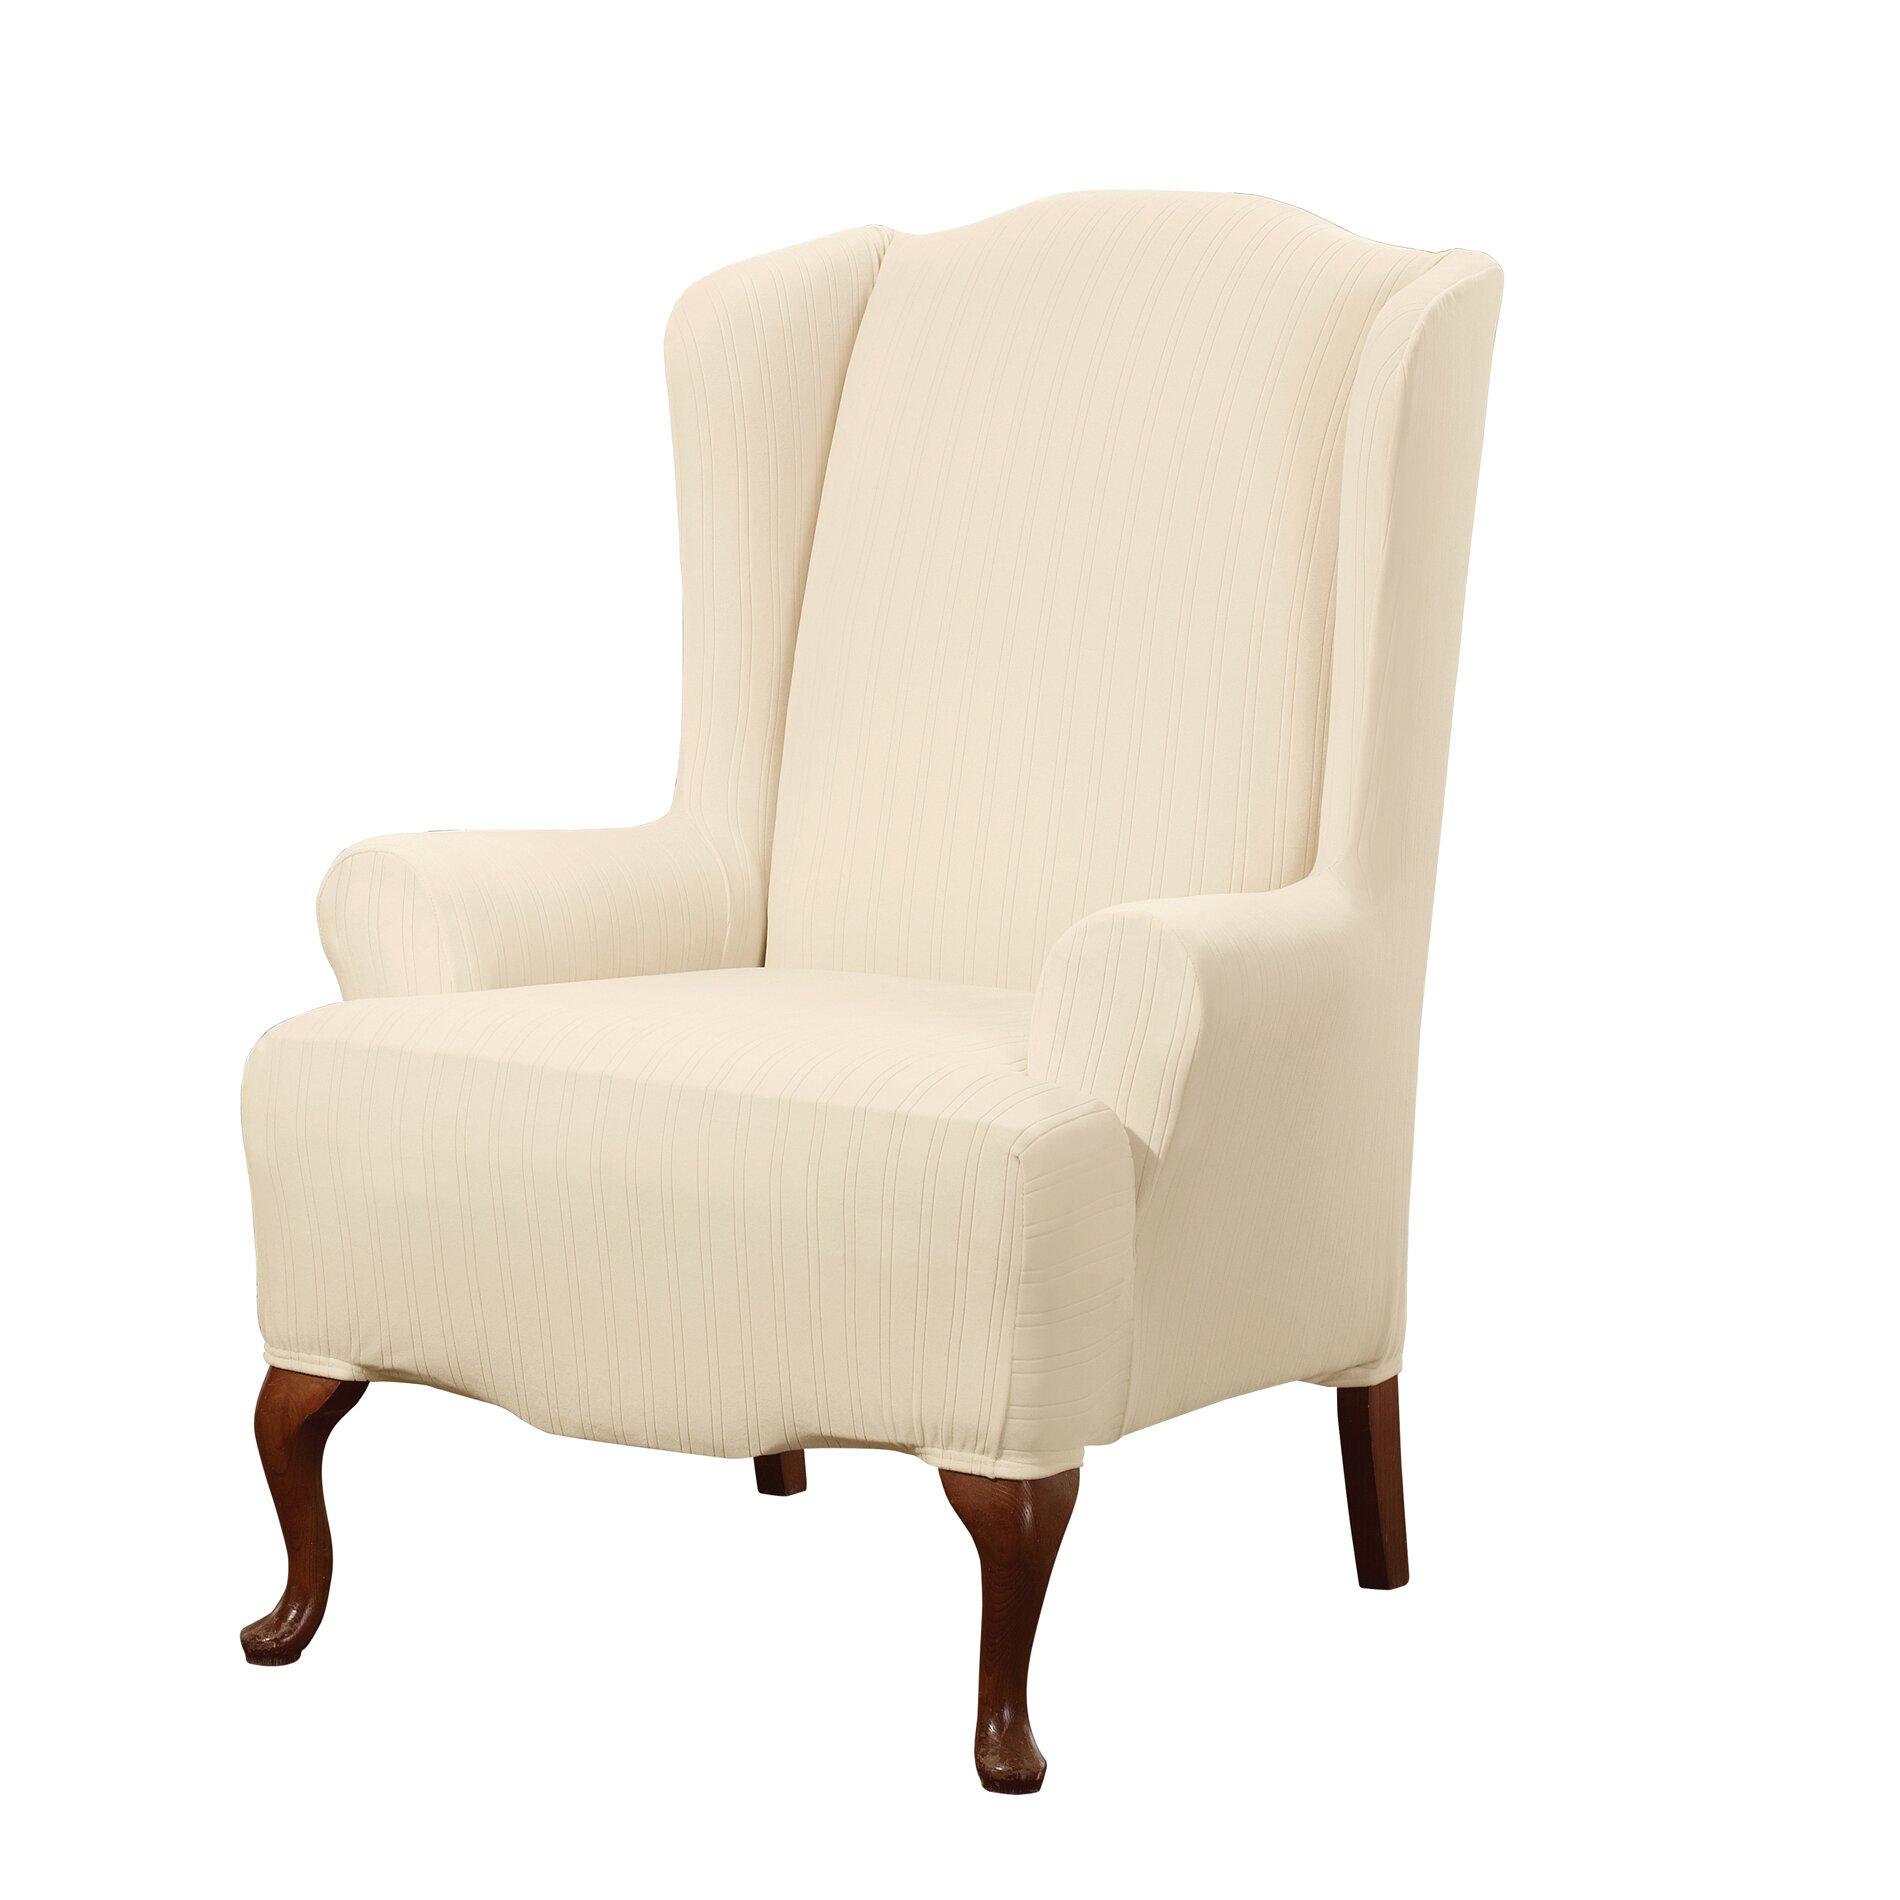 Sure Fit Stretch Pinstripe Wing Chair Slipcover amp Reviews  : StretchPinstripeWingChairSlipcover from www.wayfair.ca size 1900 x 1900 jpeg 141kB